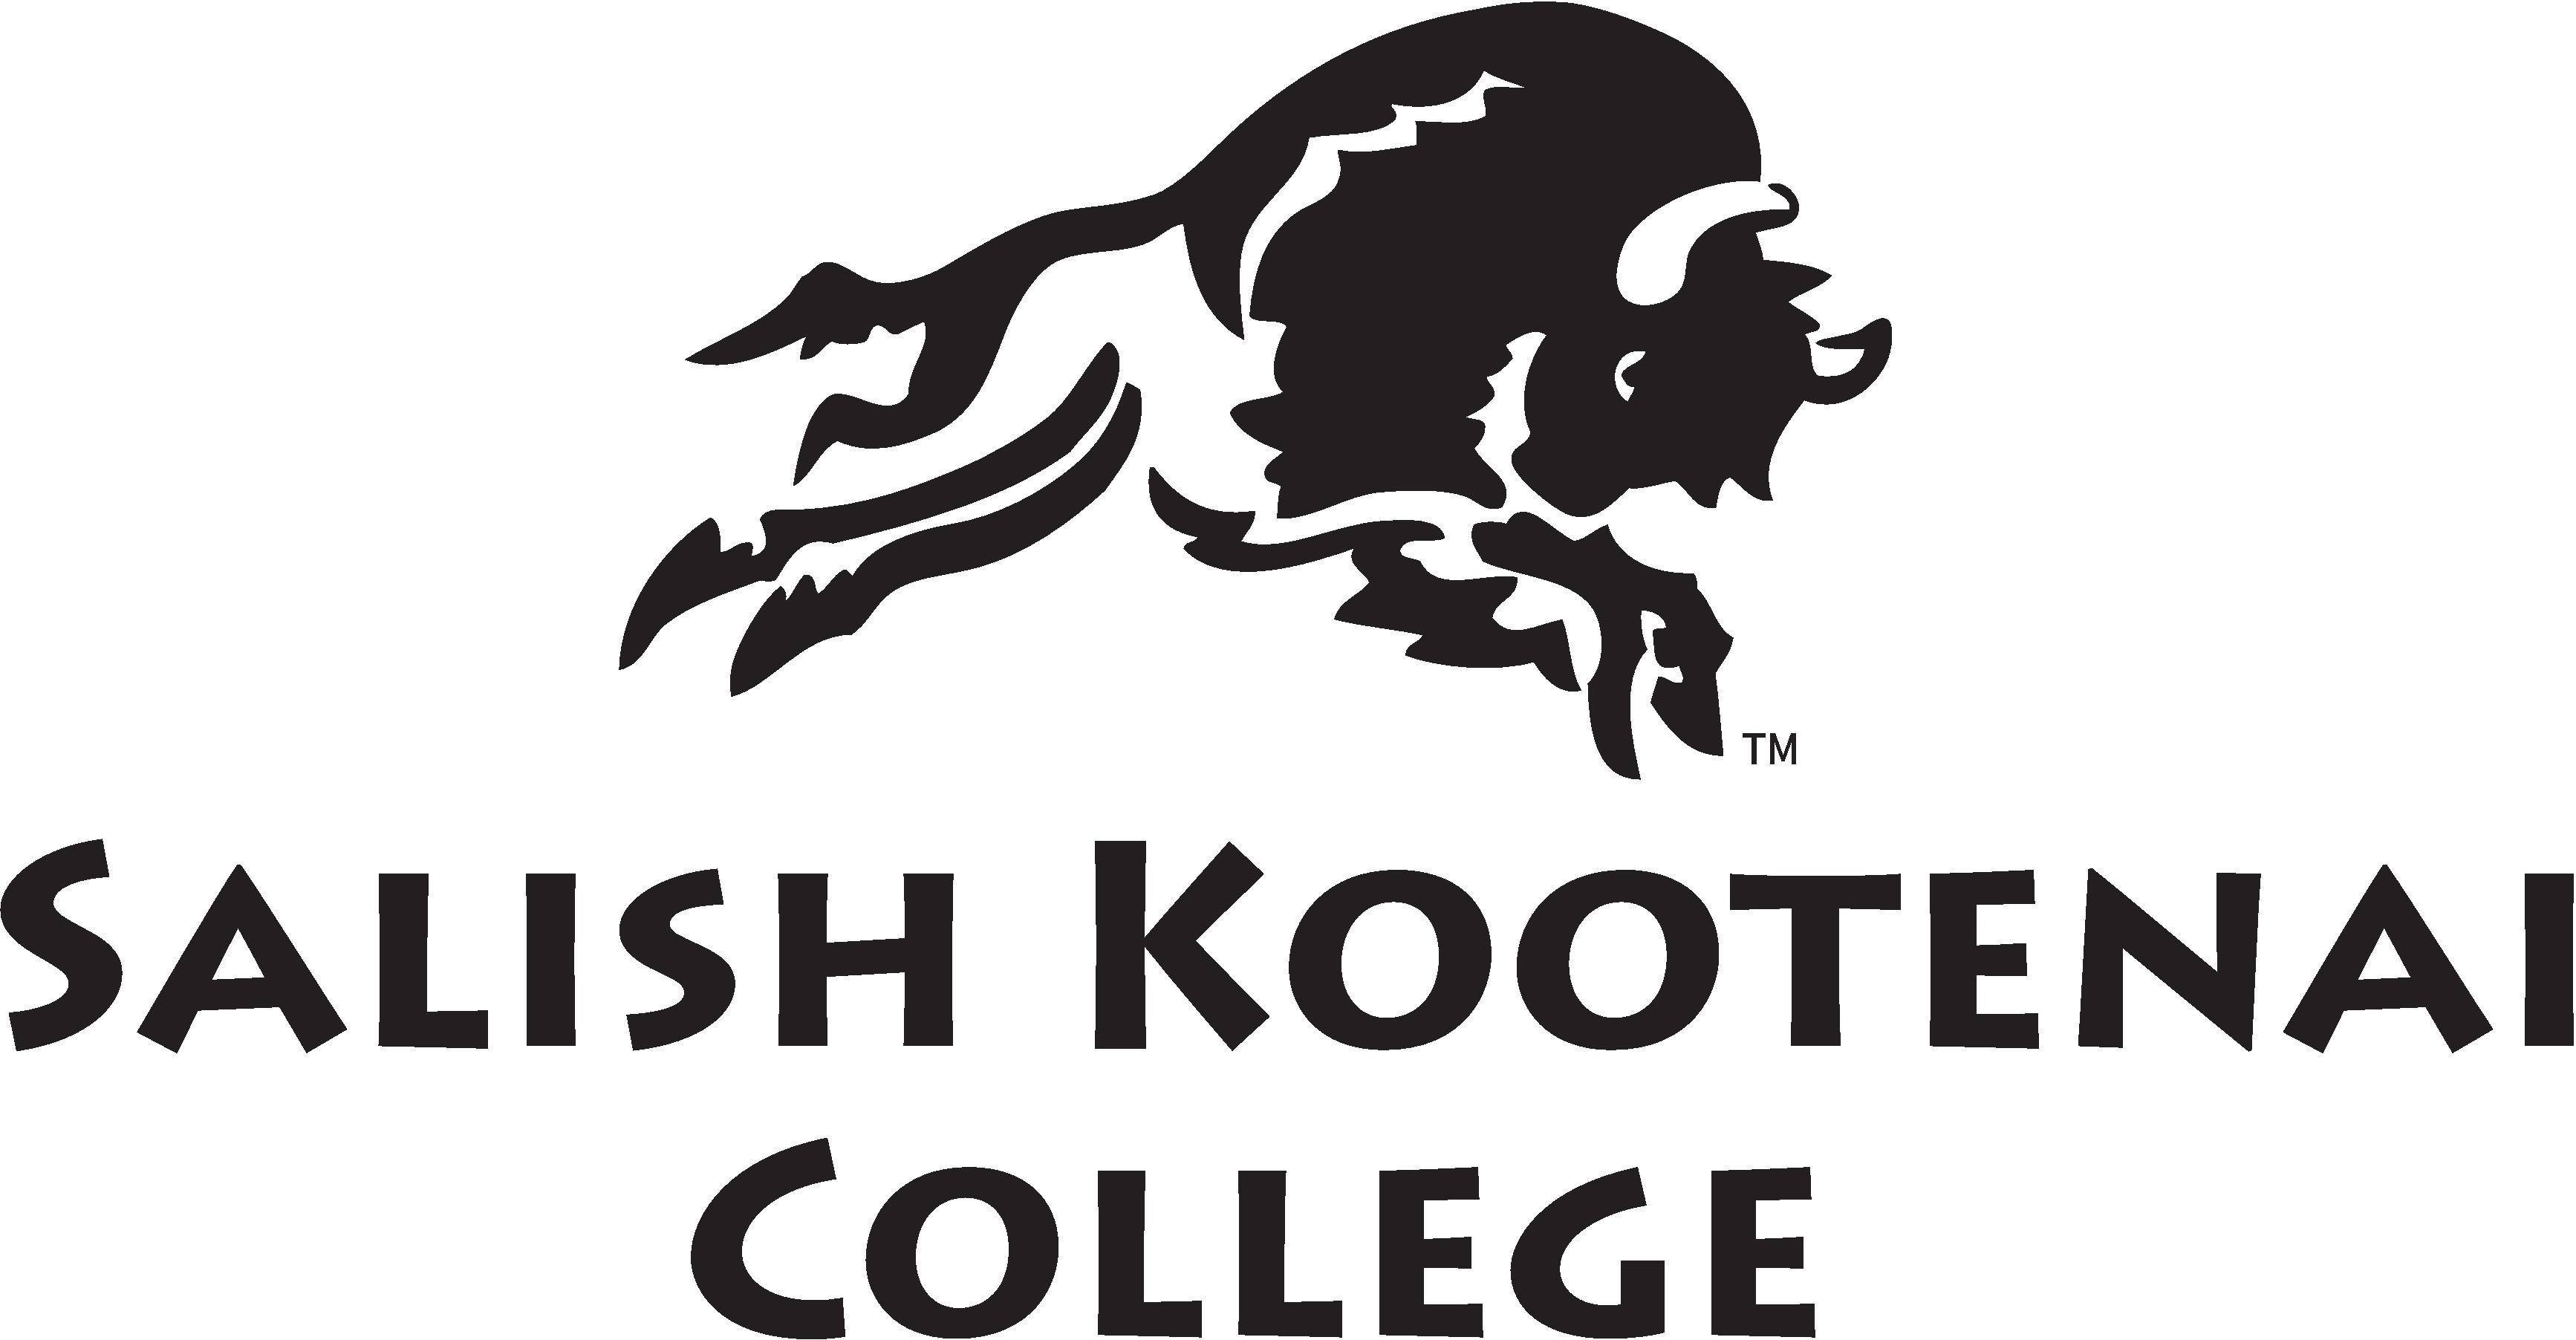 SKC Bison Logo – Salish Kootenai College Brand Style Guidelines